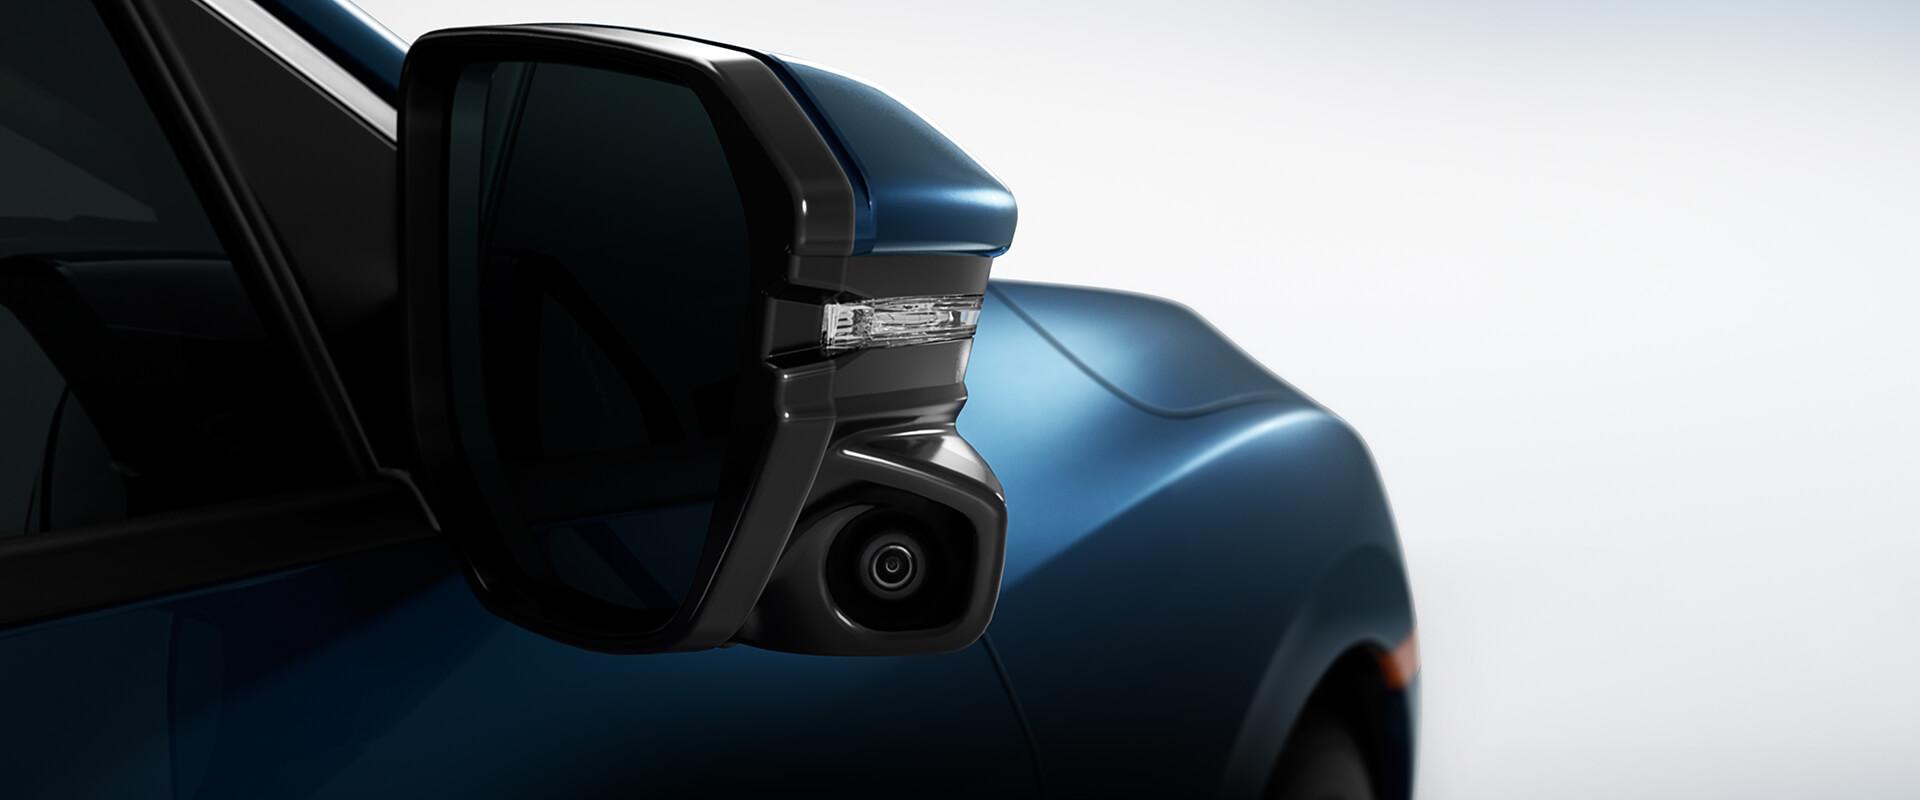 2016 Honda Accord Sedan Lane Watch